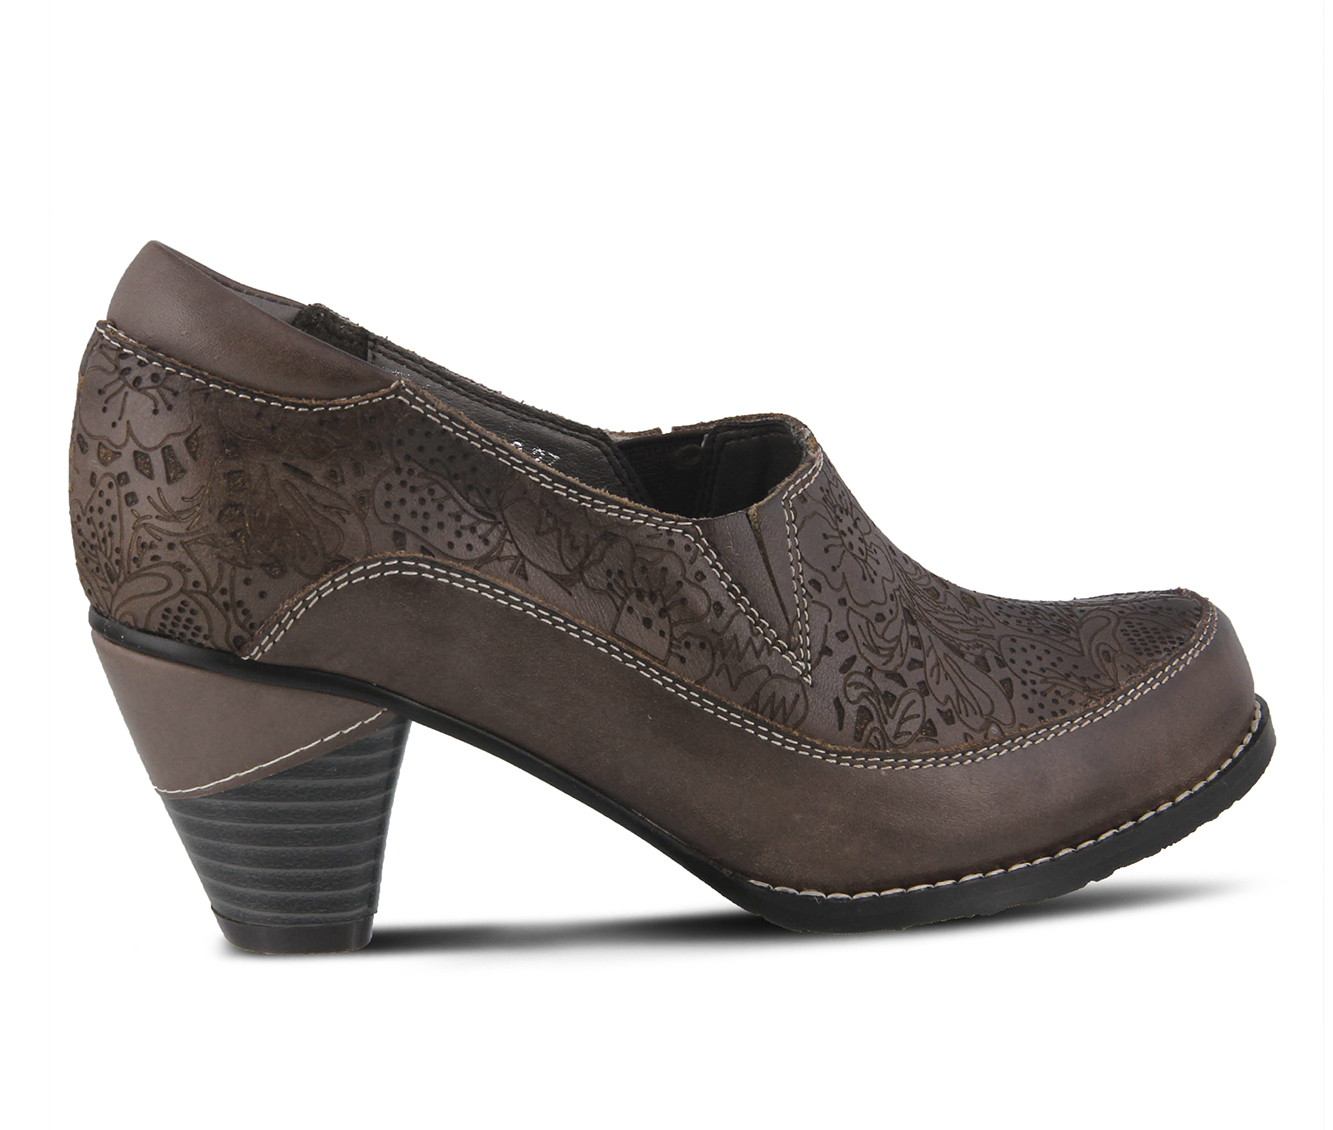 L'Artiste Liboreel Women's Dress Shoe (Brown Leather)